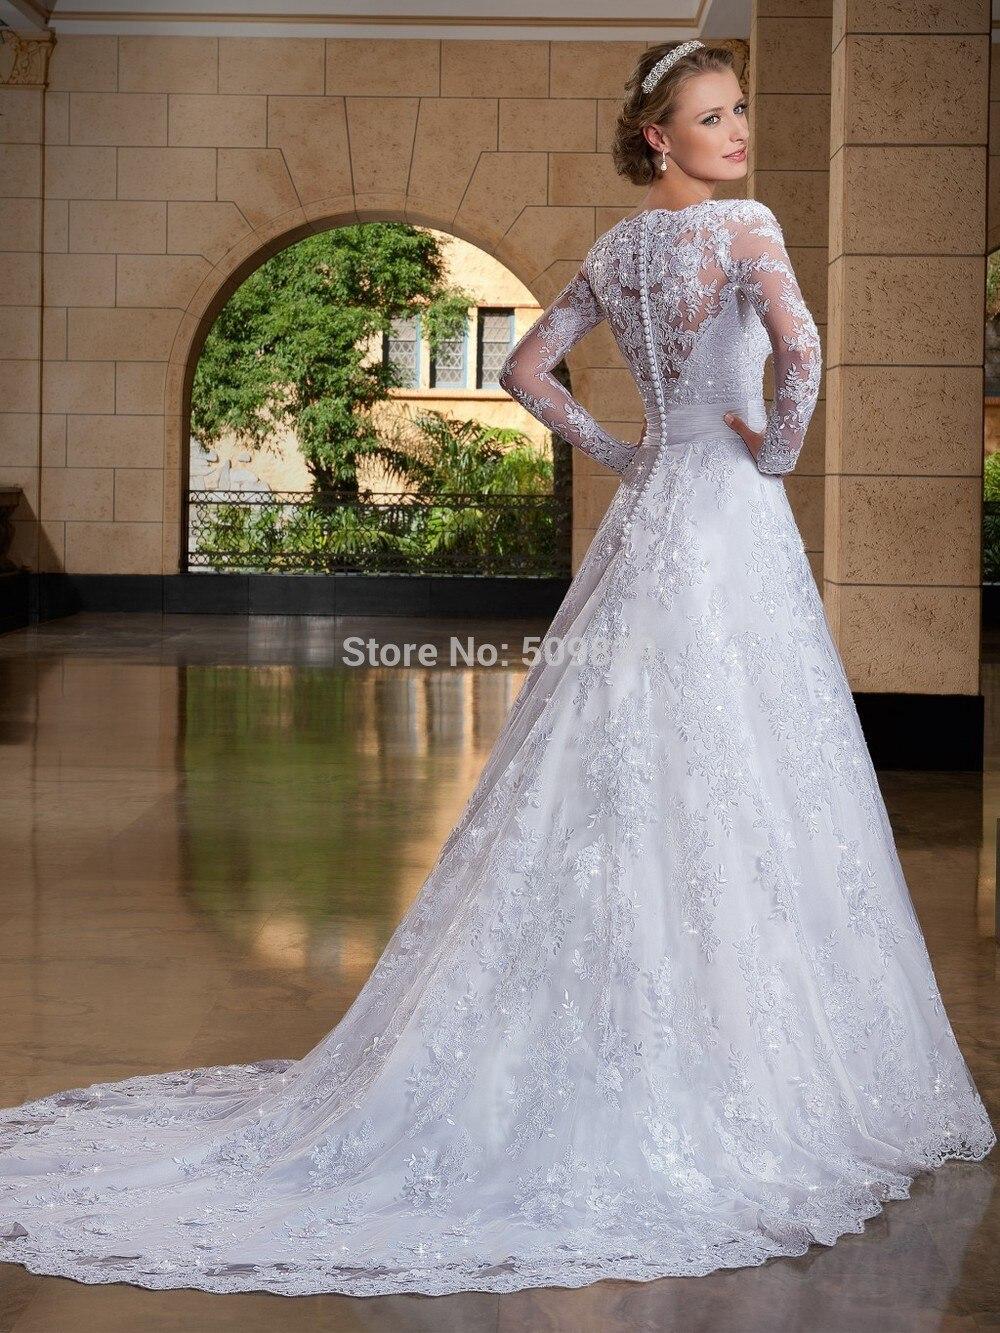 the seasons sexiest wedding b see through wedding dresses